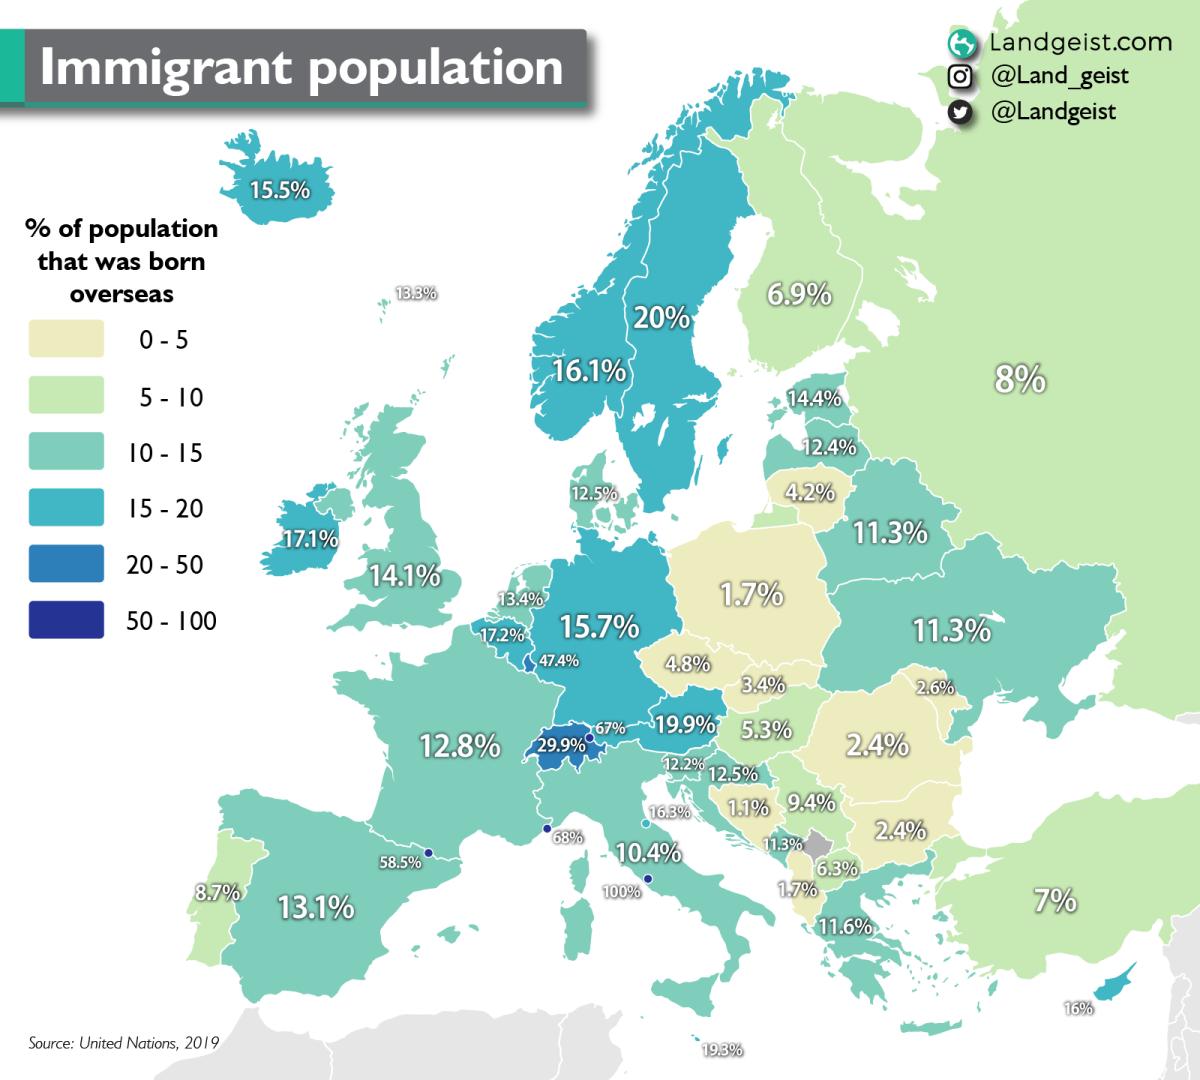 Percentage of population born overseas in Europe.